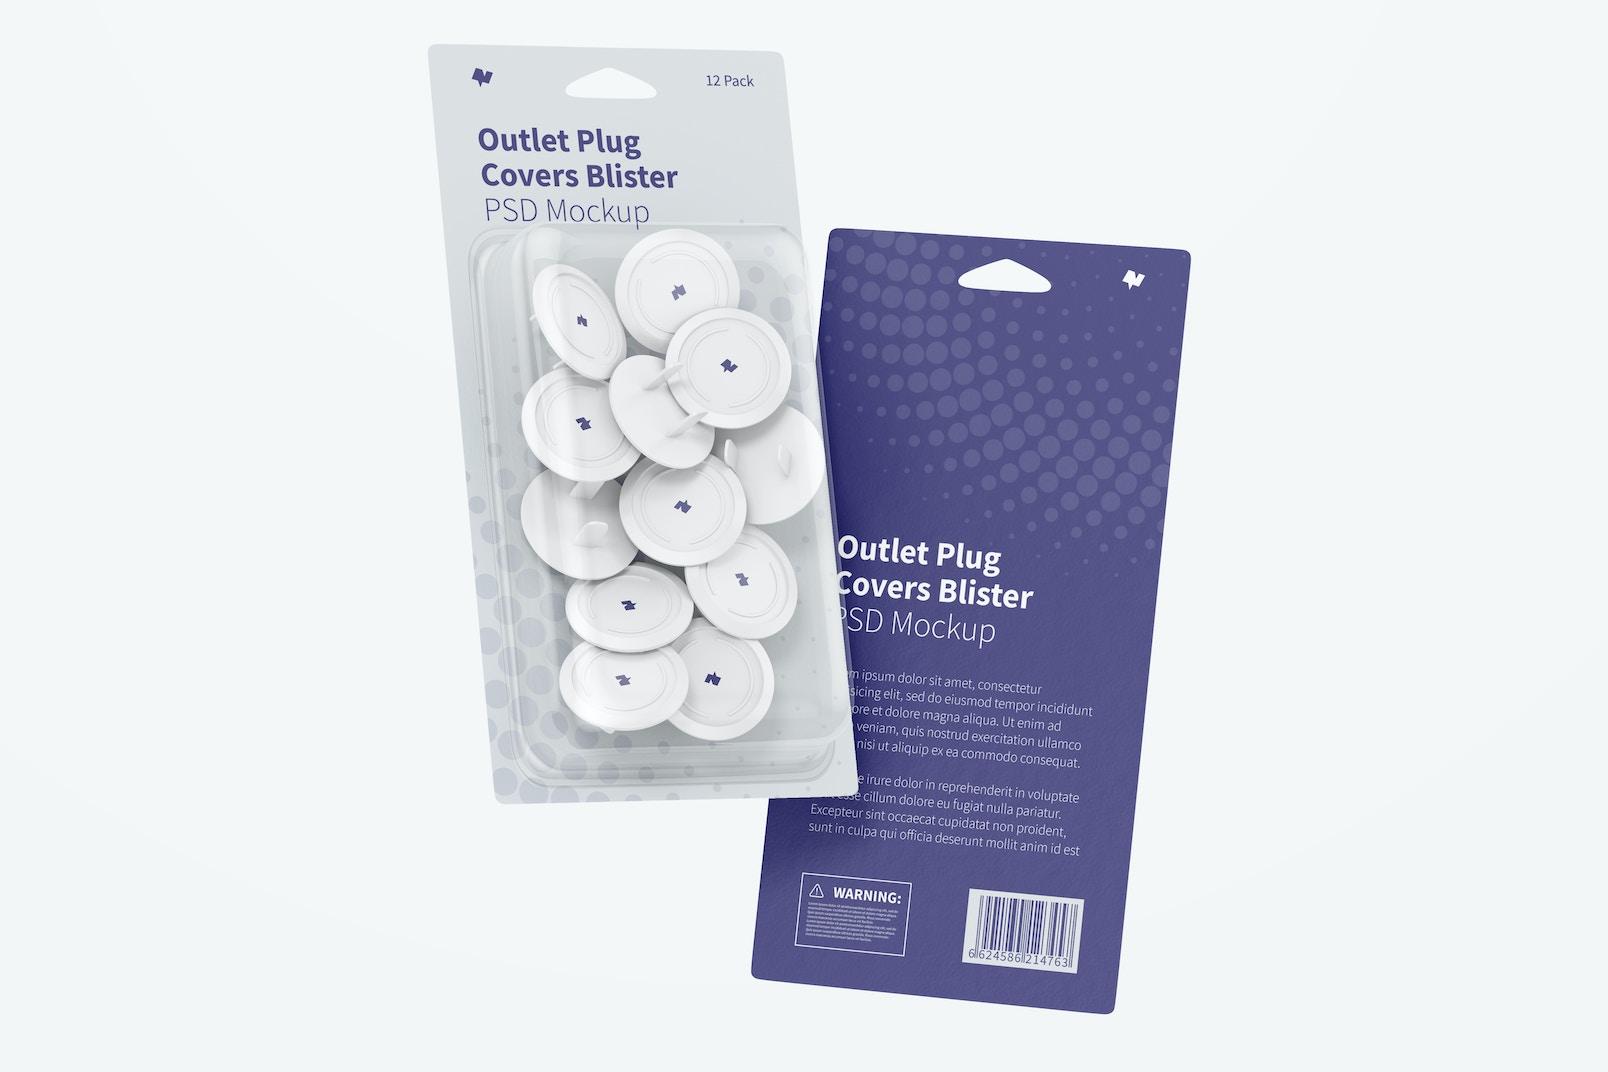 Outlet Plug Covers Blister Mockup, Floating